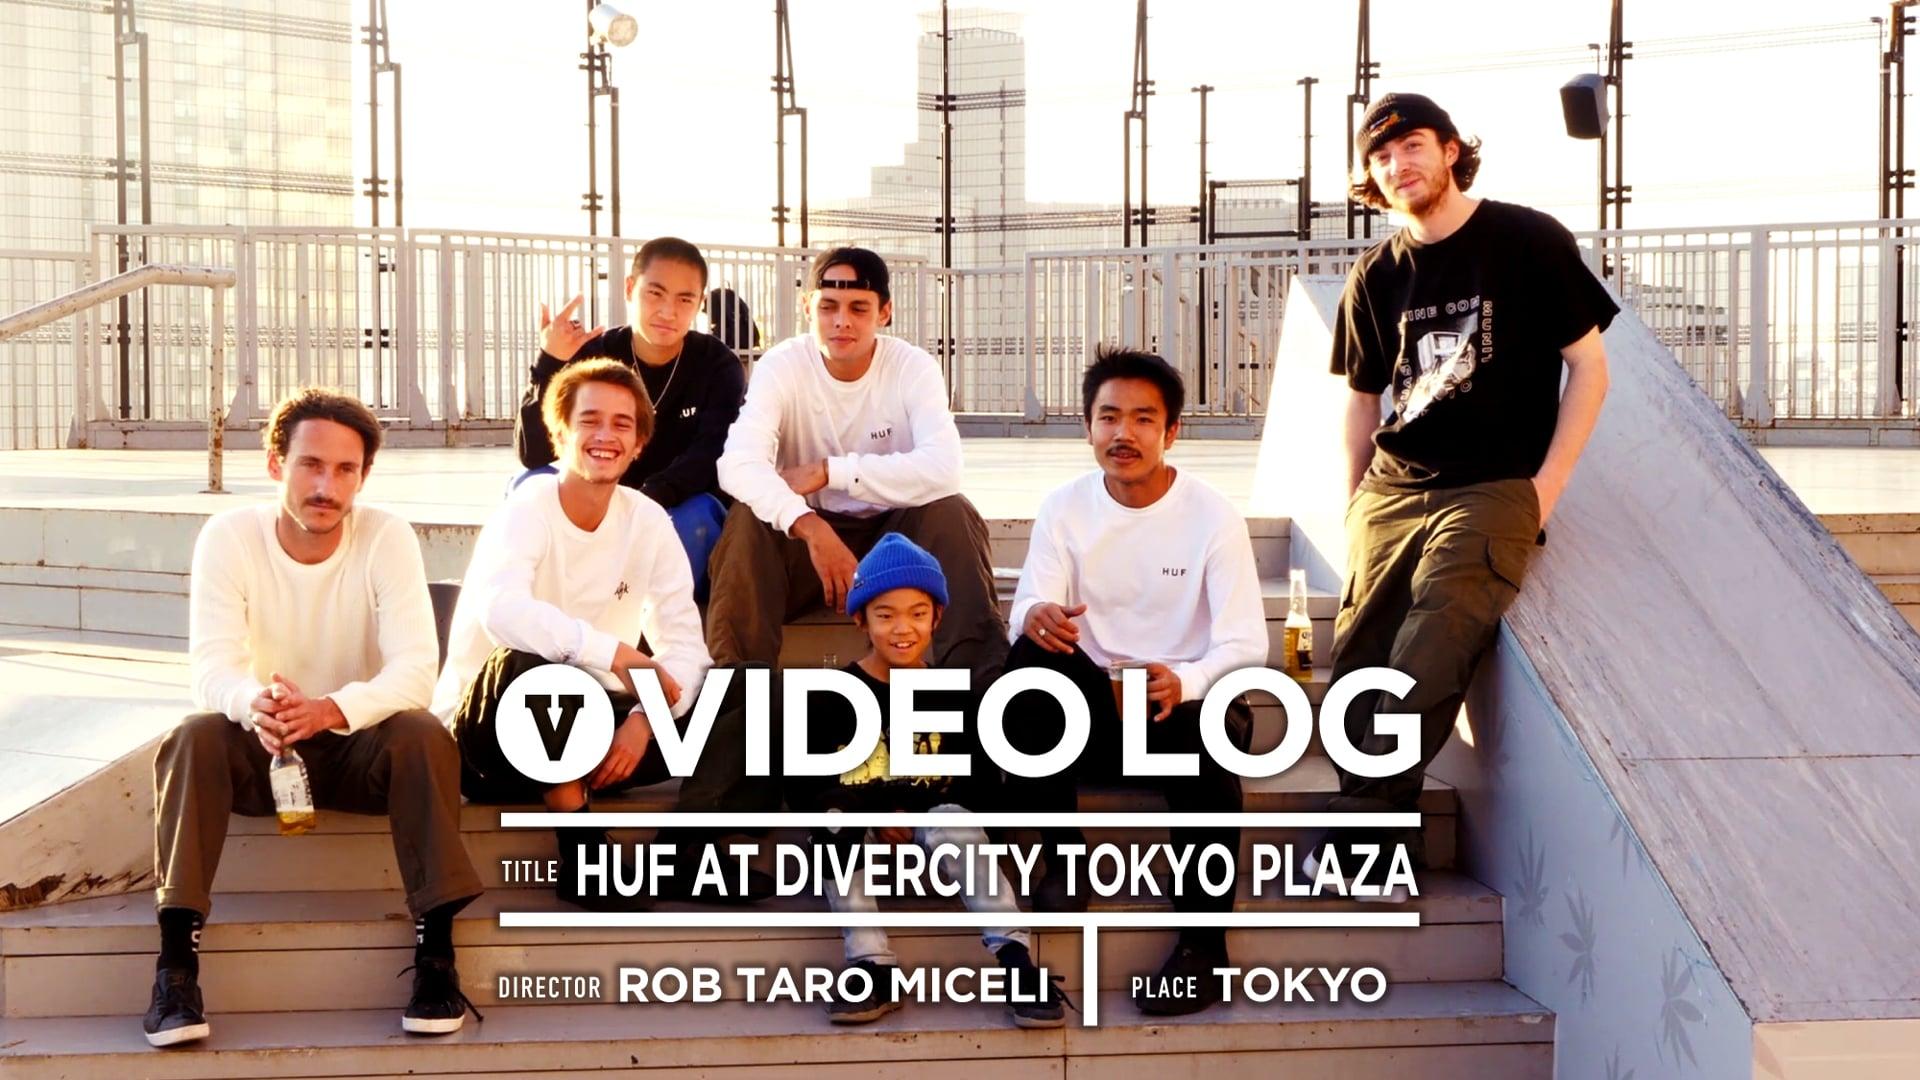 [VIDEO LOG] HUF AT DIVERCITY TOKYO PLAZA